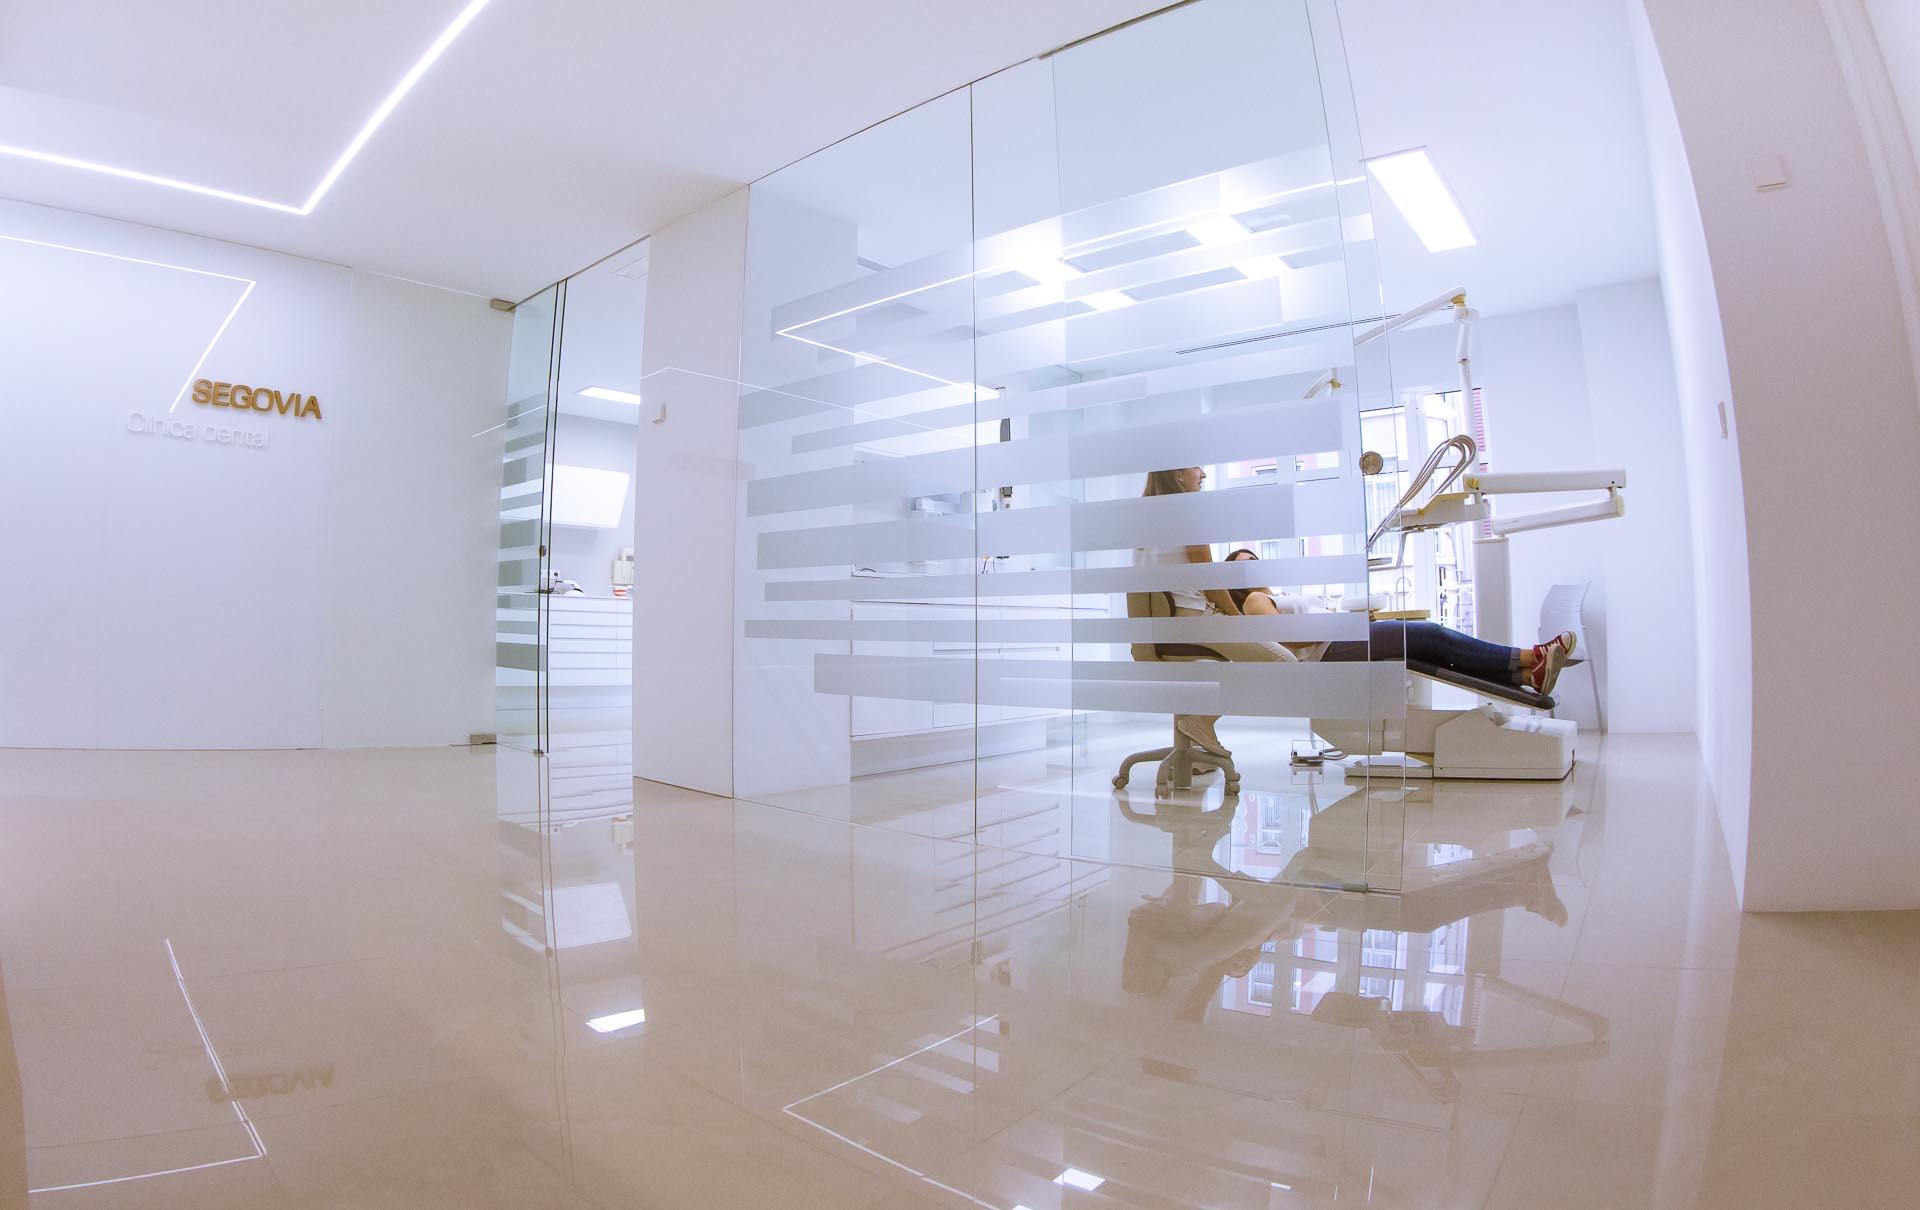 Dentista en valencia cl nica dental segovia en valencia - Clinica dental segovia ...